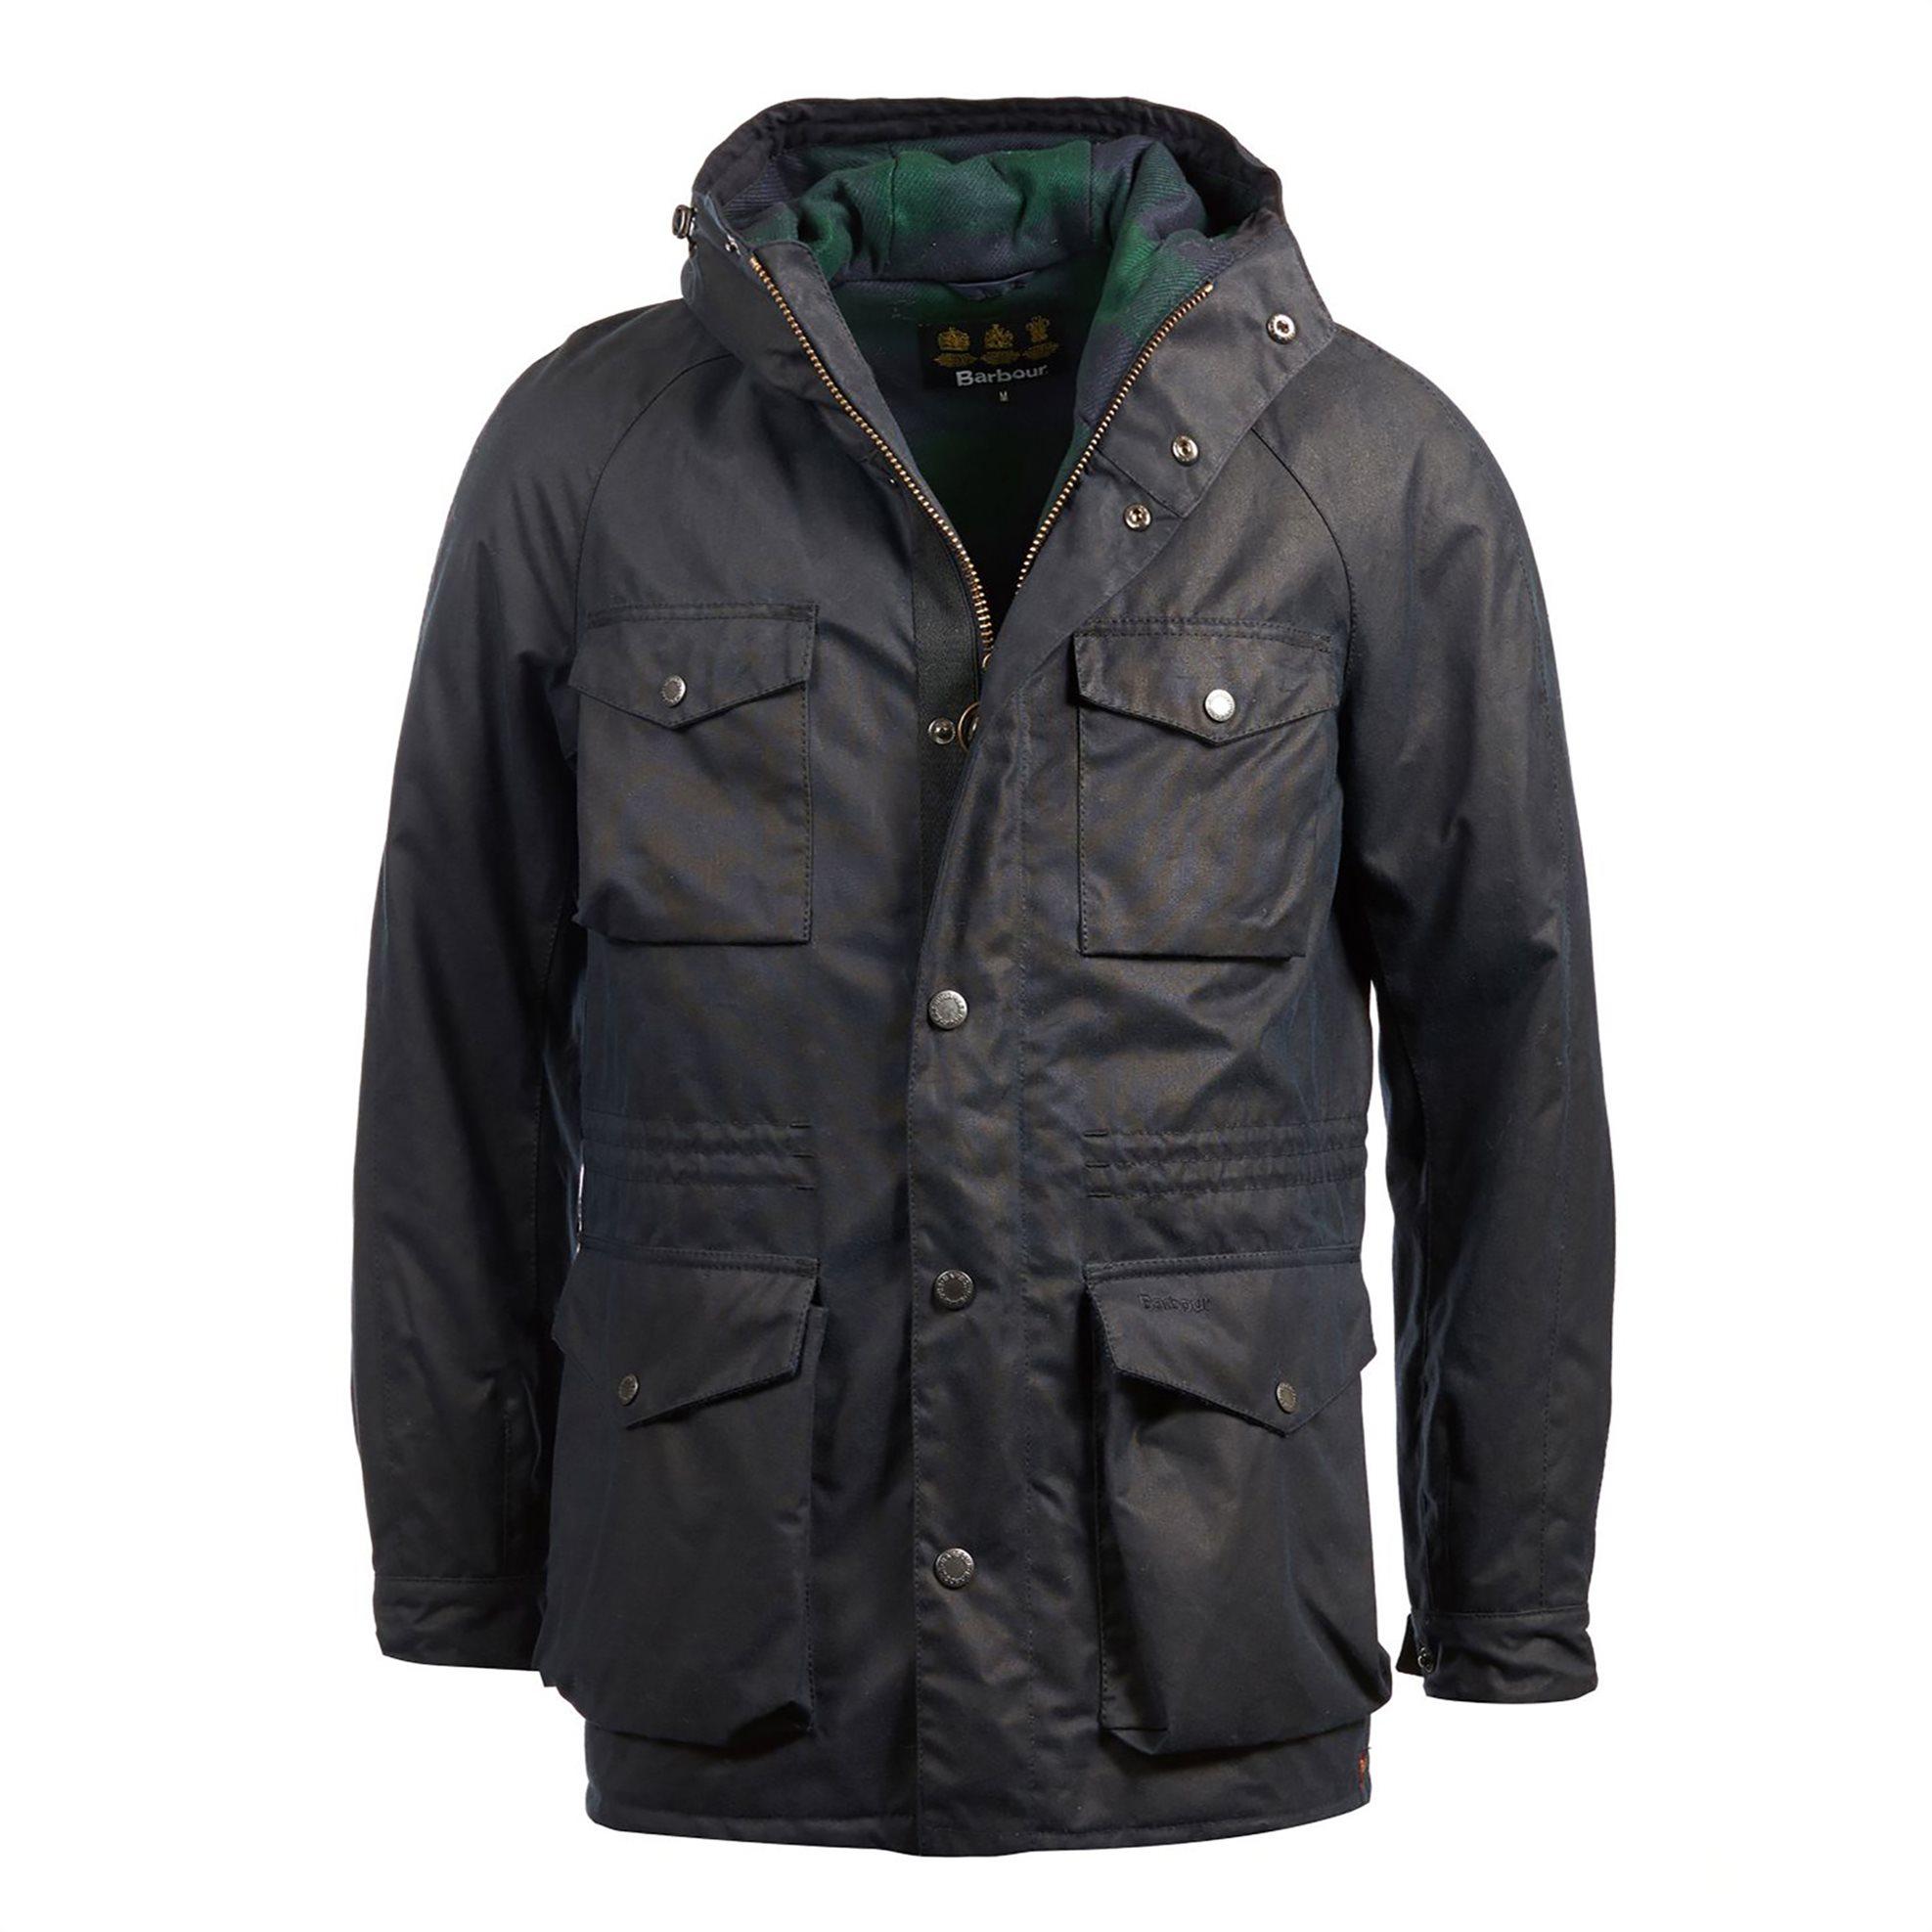 BarbourανδρικόμπουφάνColl - MWX1399 - Μπλε Σκούρο ανδρασ   ρουχα   παλτό   μπουφάν   μπουφάν